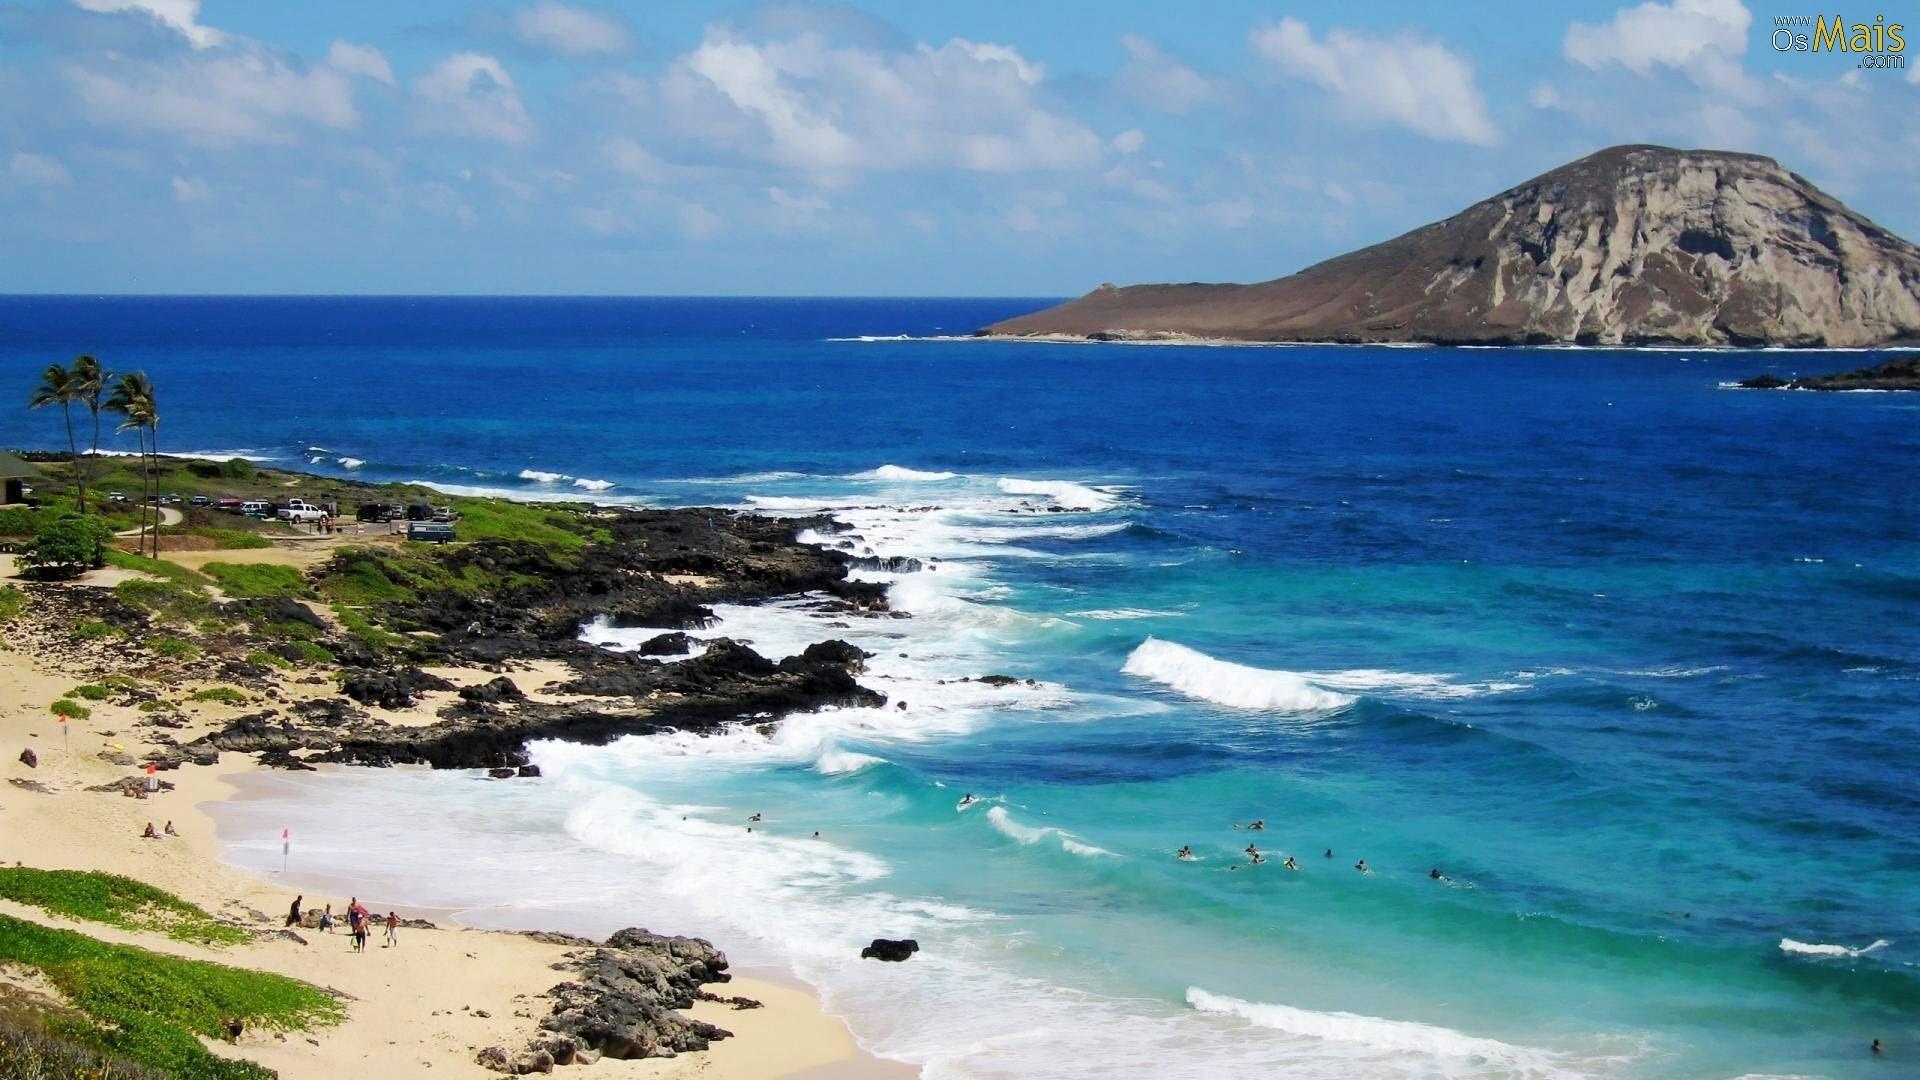 hawaii wallpaper full hd